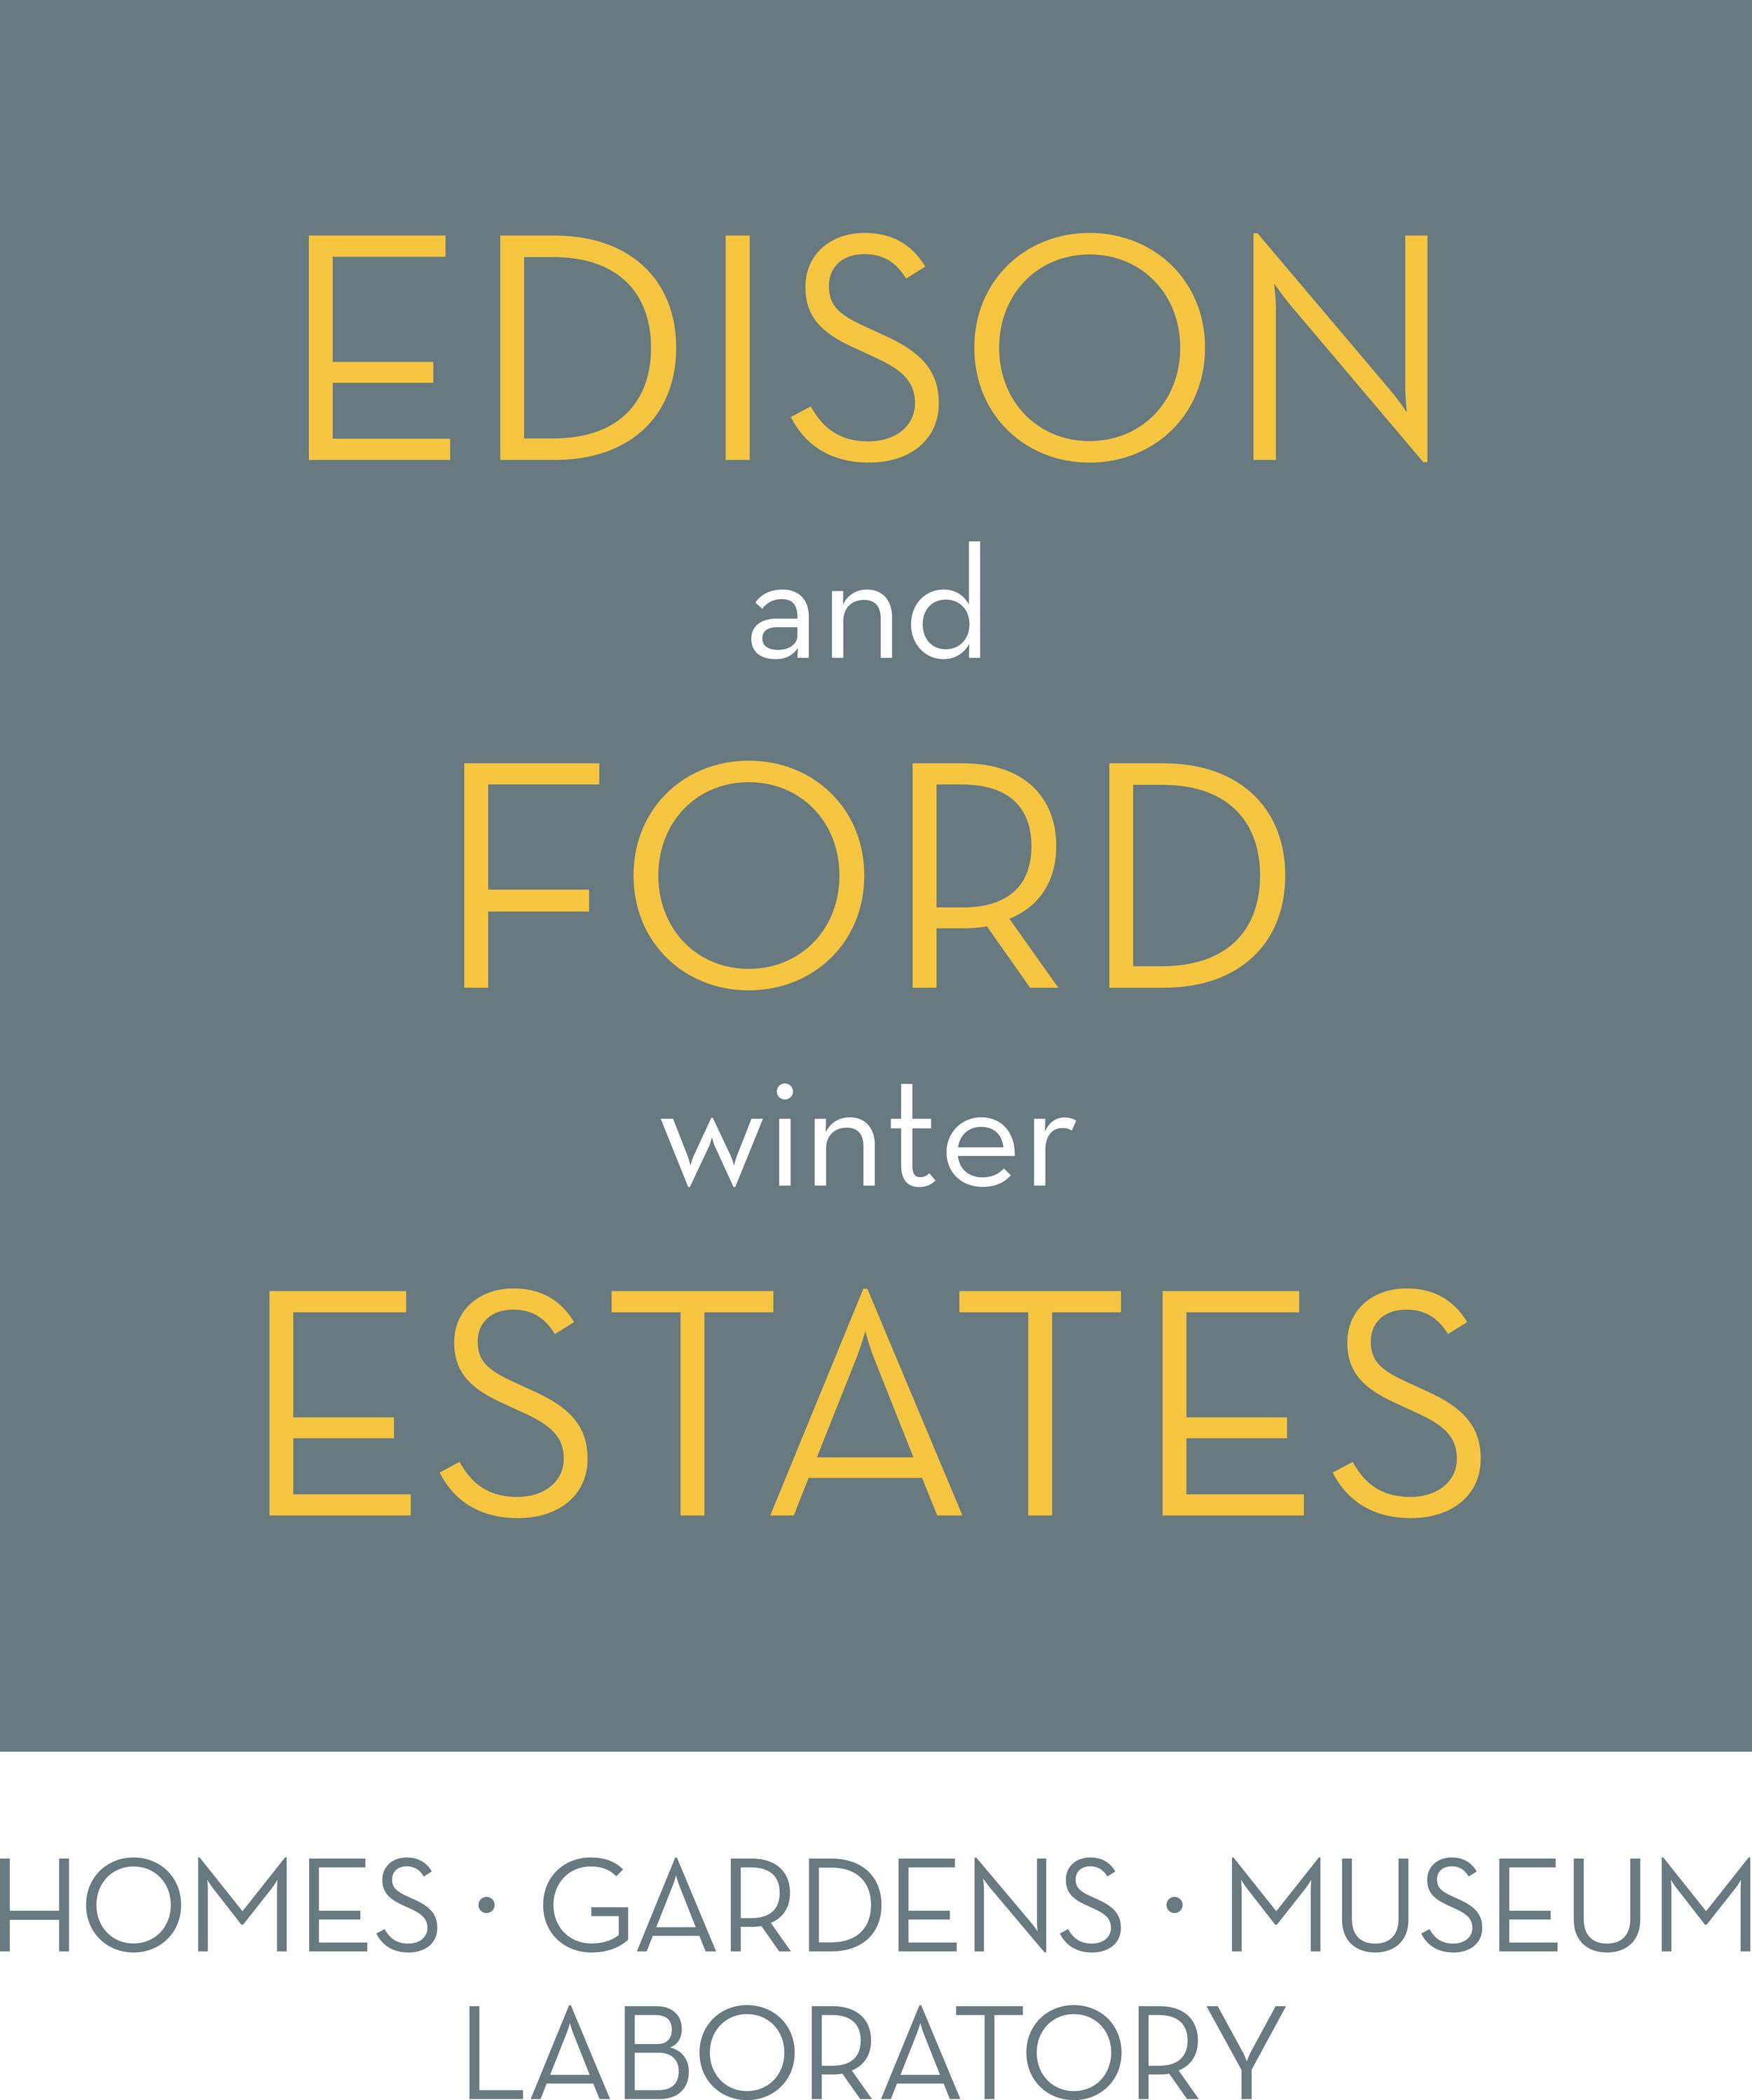 EdisonFordEstates_new_logo_2color_tagline.jpg